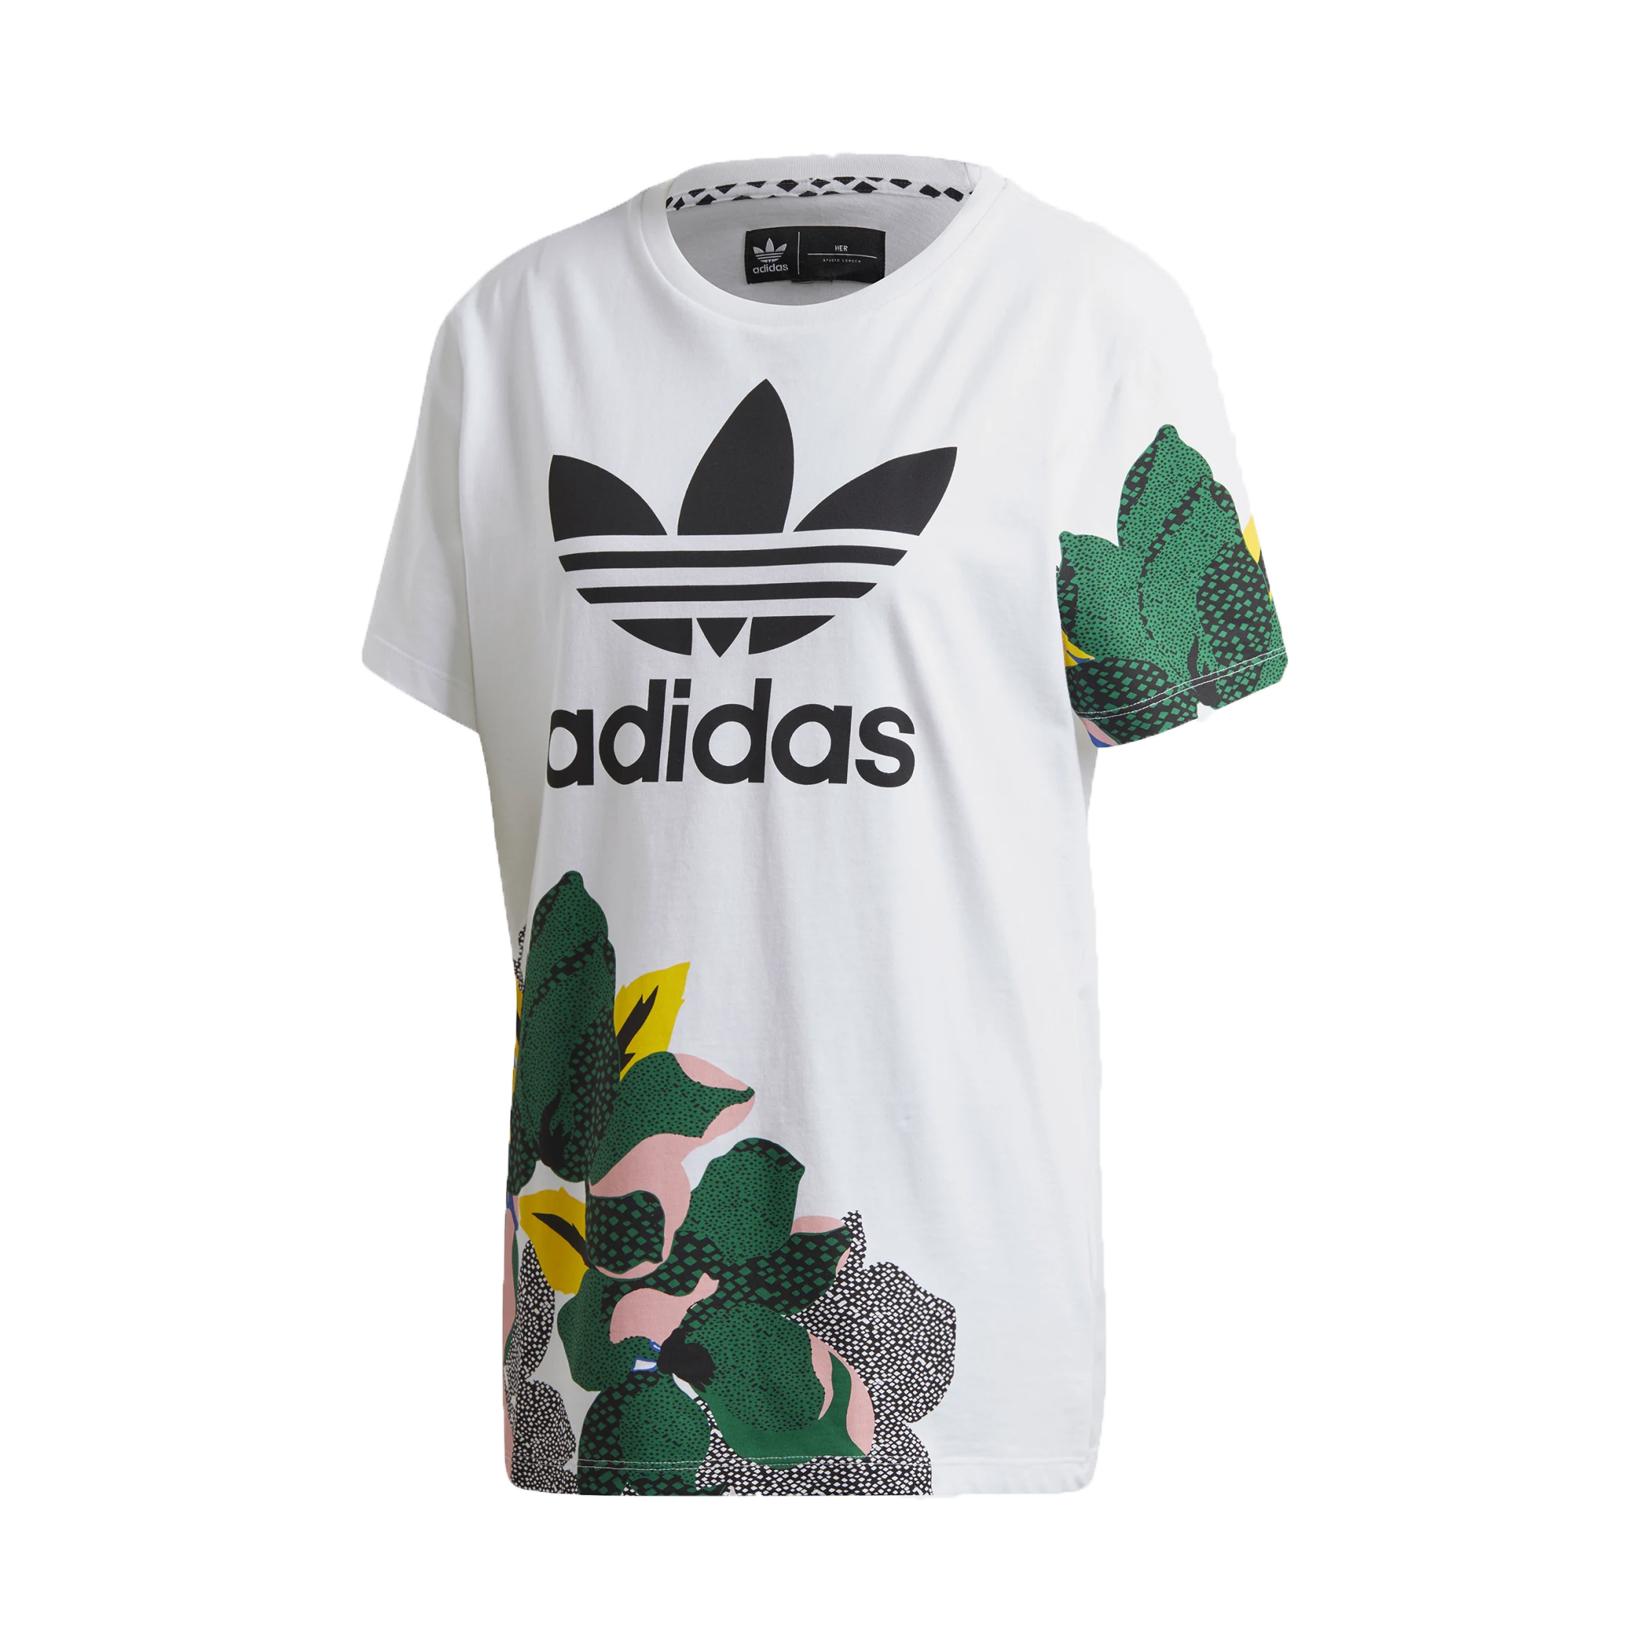 Adidas Originals Her Studio London Loose Tee White